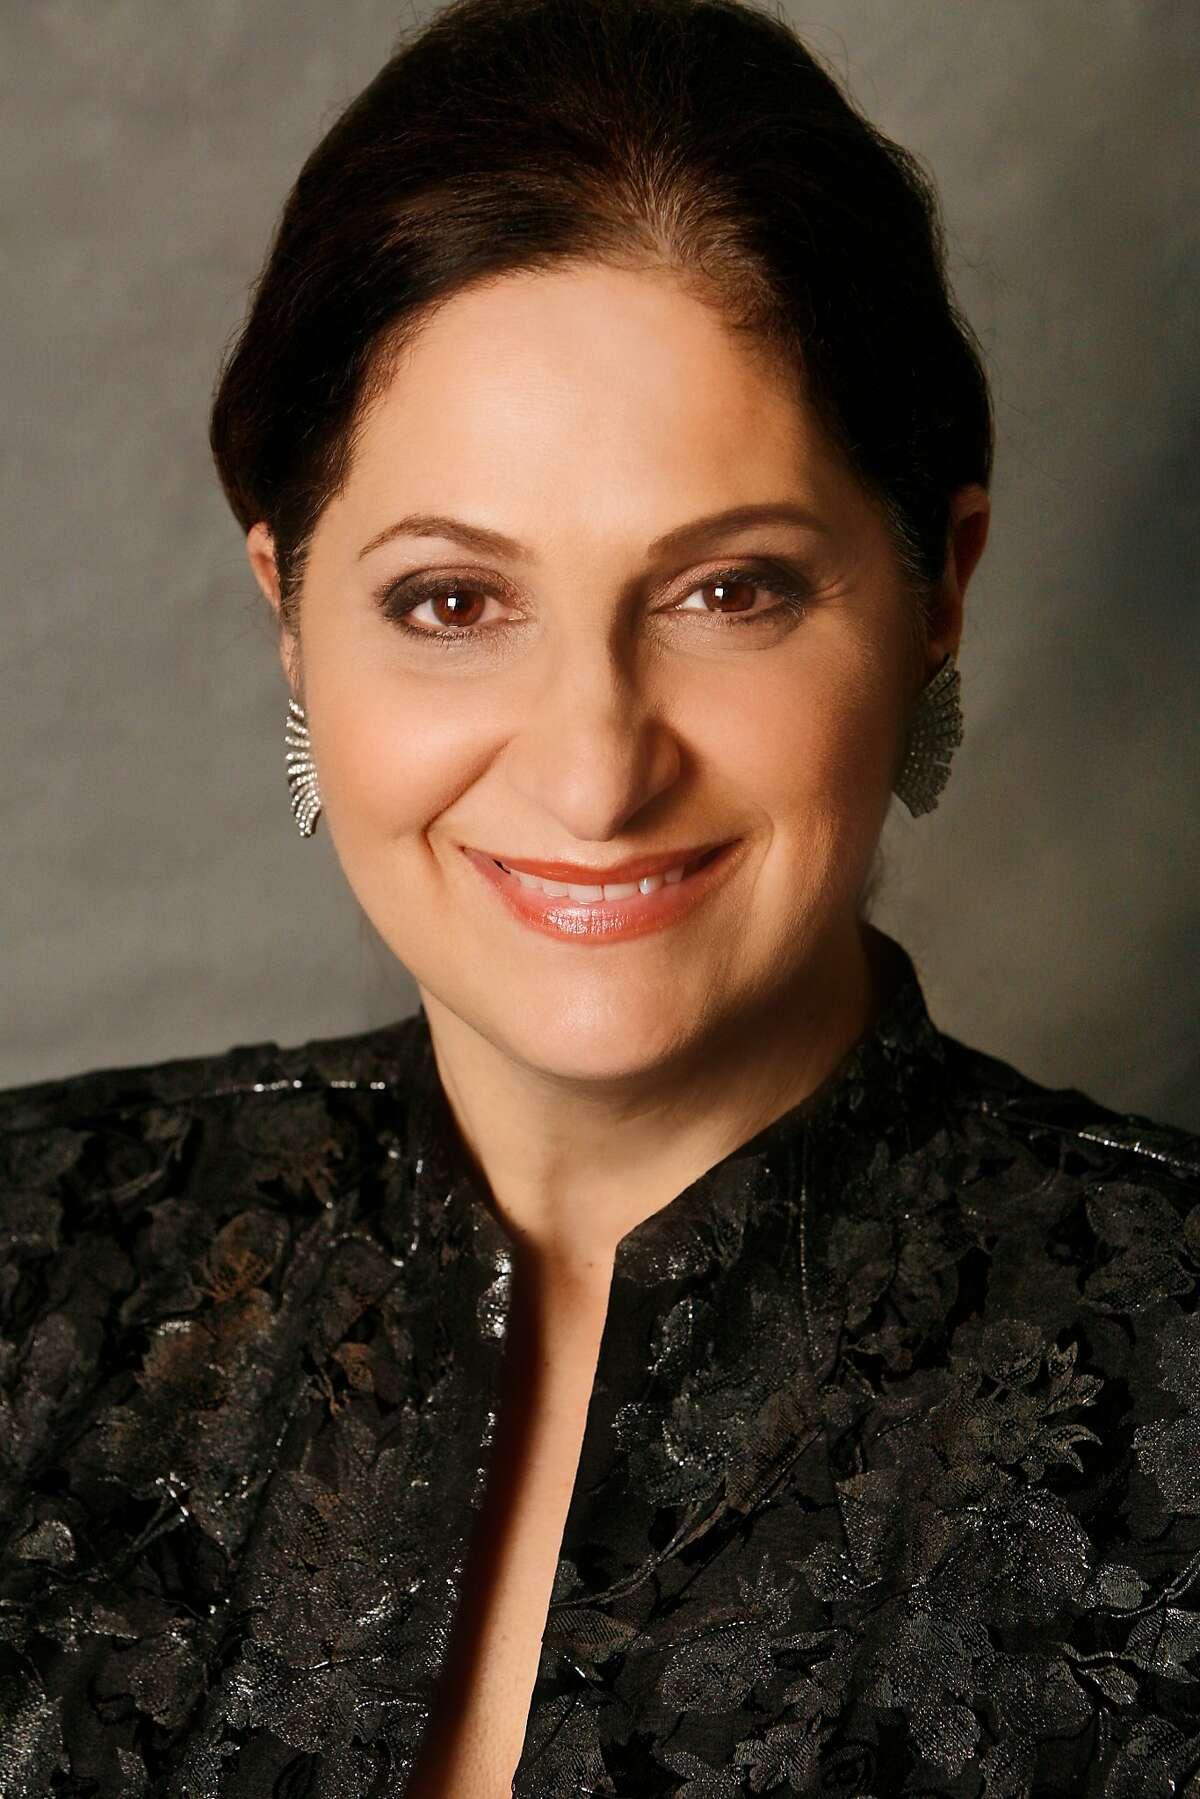 Festival Opera Executive Director Sara Nealy